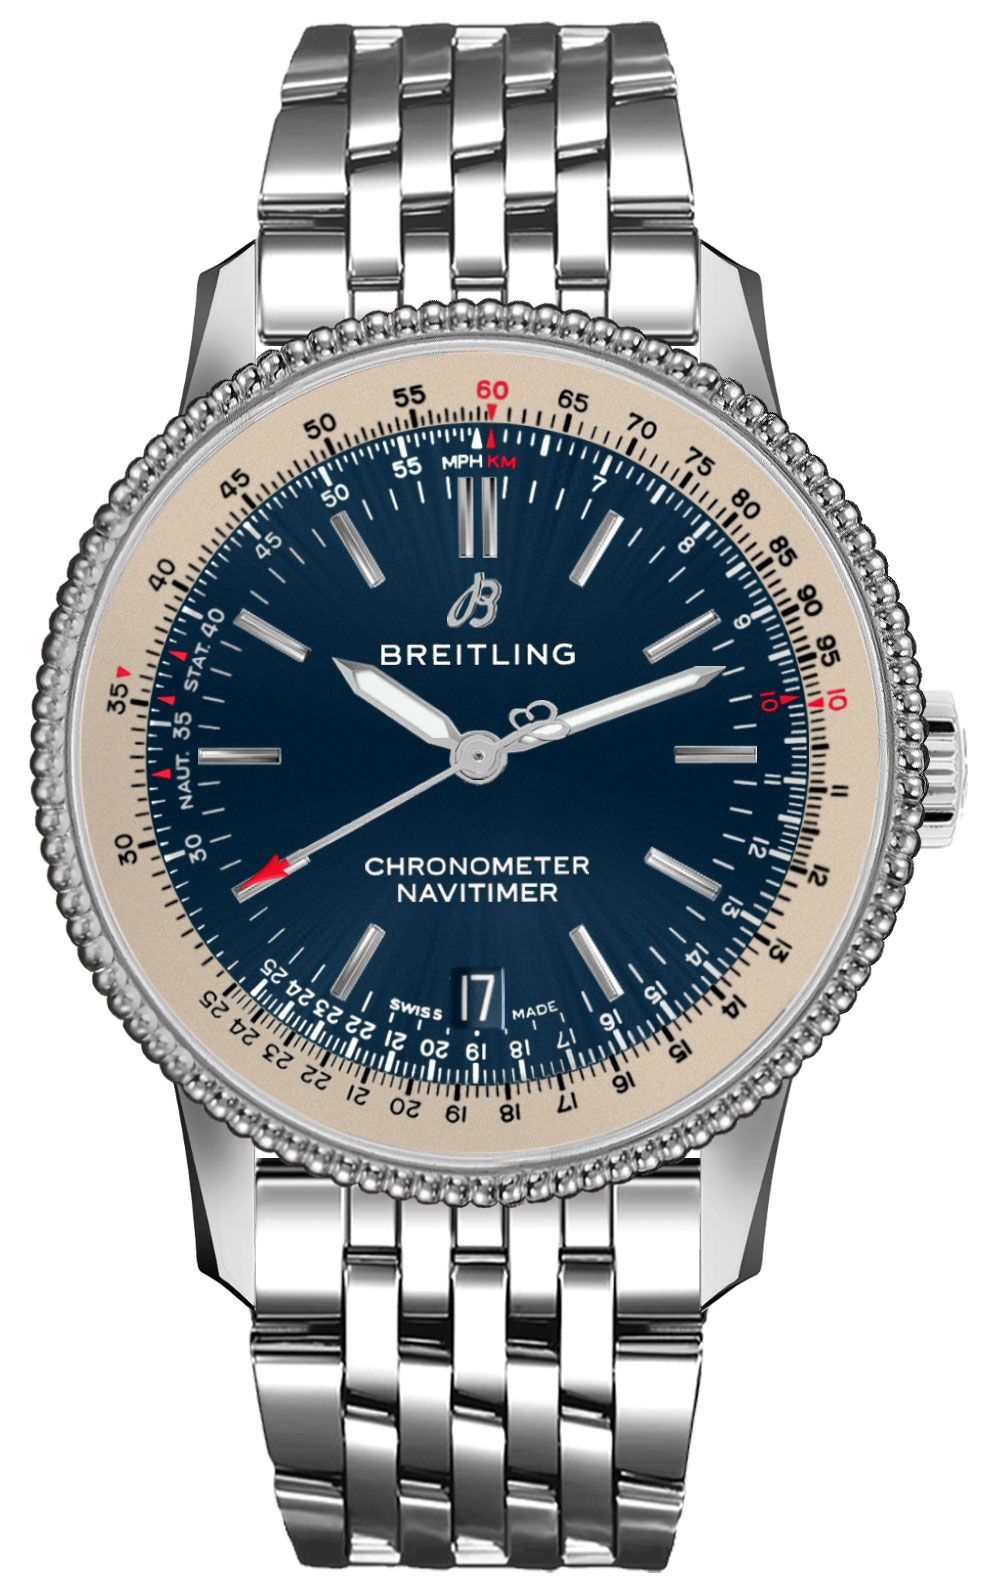 8ca39010e1 Breitling Navitimer 1 Automatic 38 A17325211C1A1 Item    A17325211C1A1